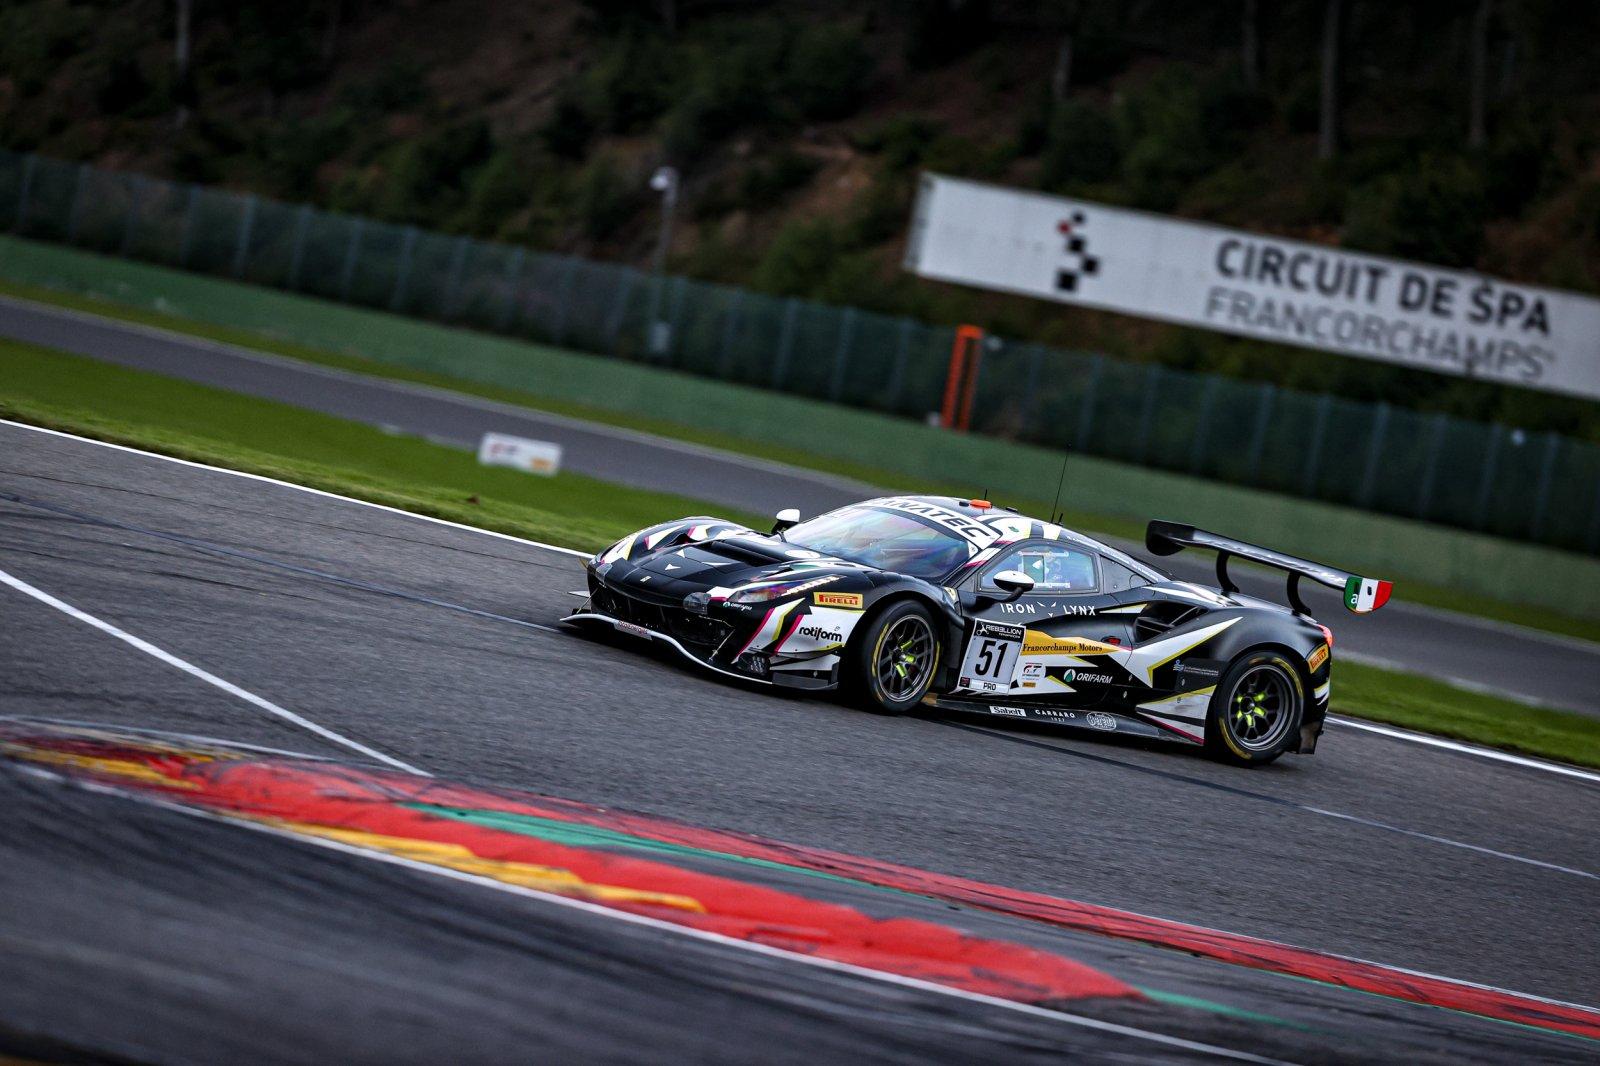 Comfortable lead for Iron Lynx Ferrari at the 14-hour mark